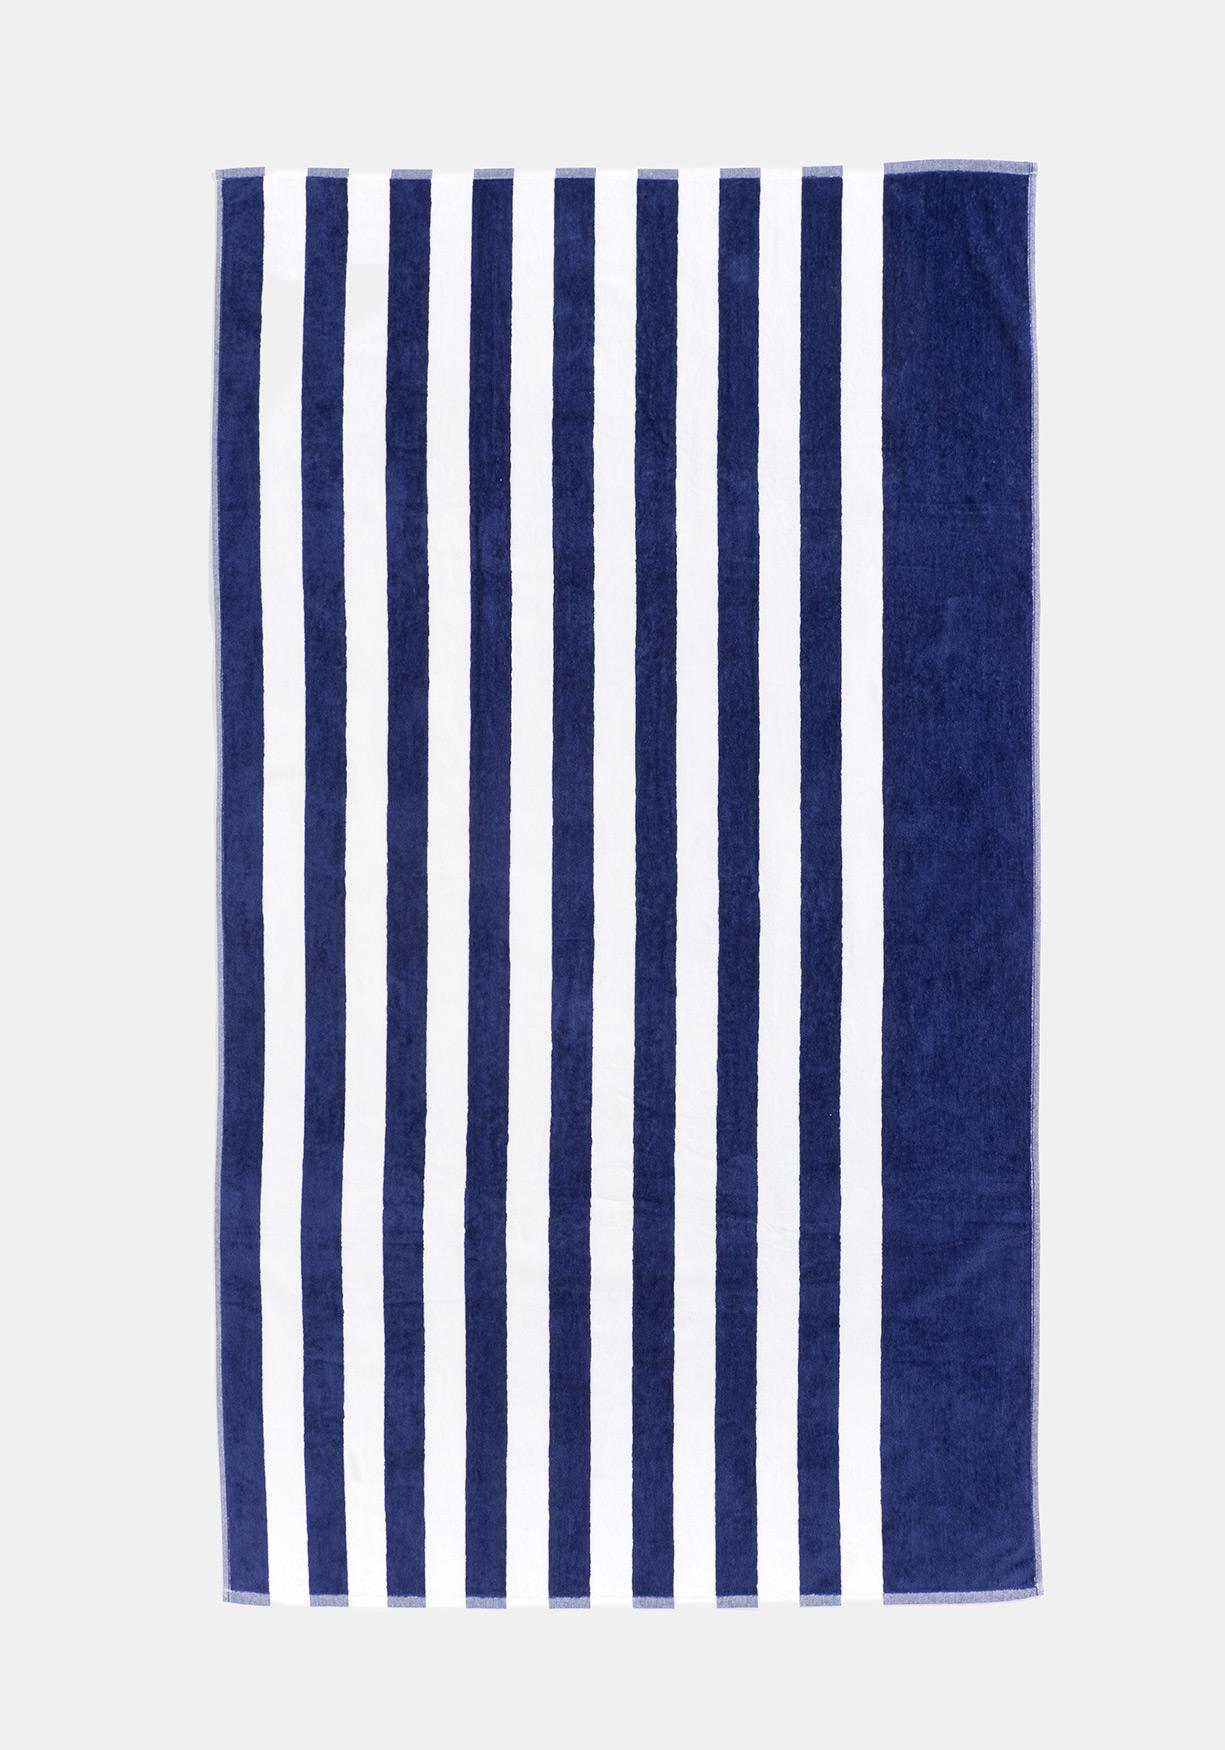 9188a149b2ef Comprar Toalla de Playa Jacquard de Rayas TEX 100x180 cm Azul ...